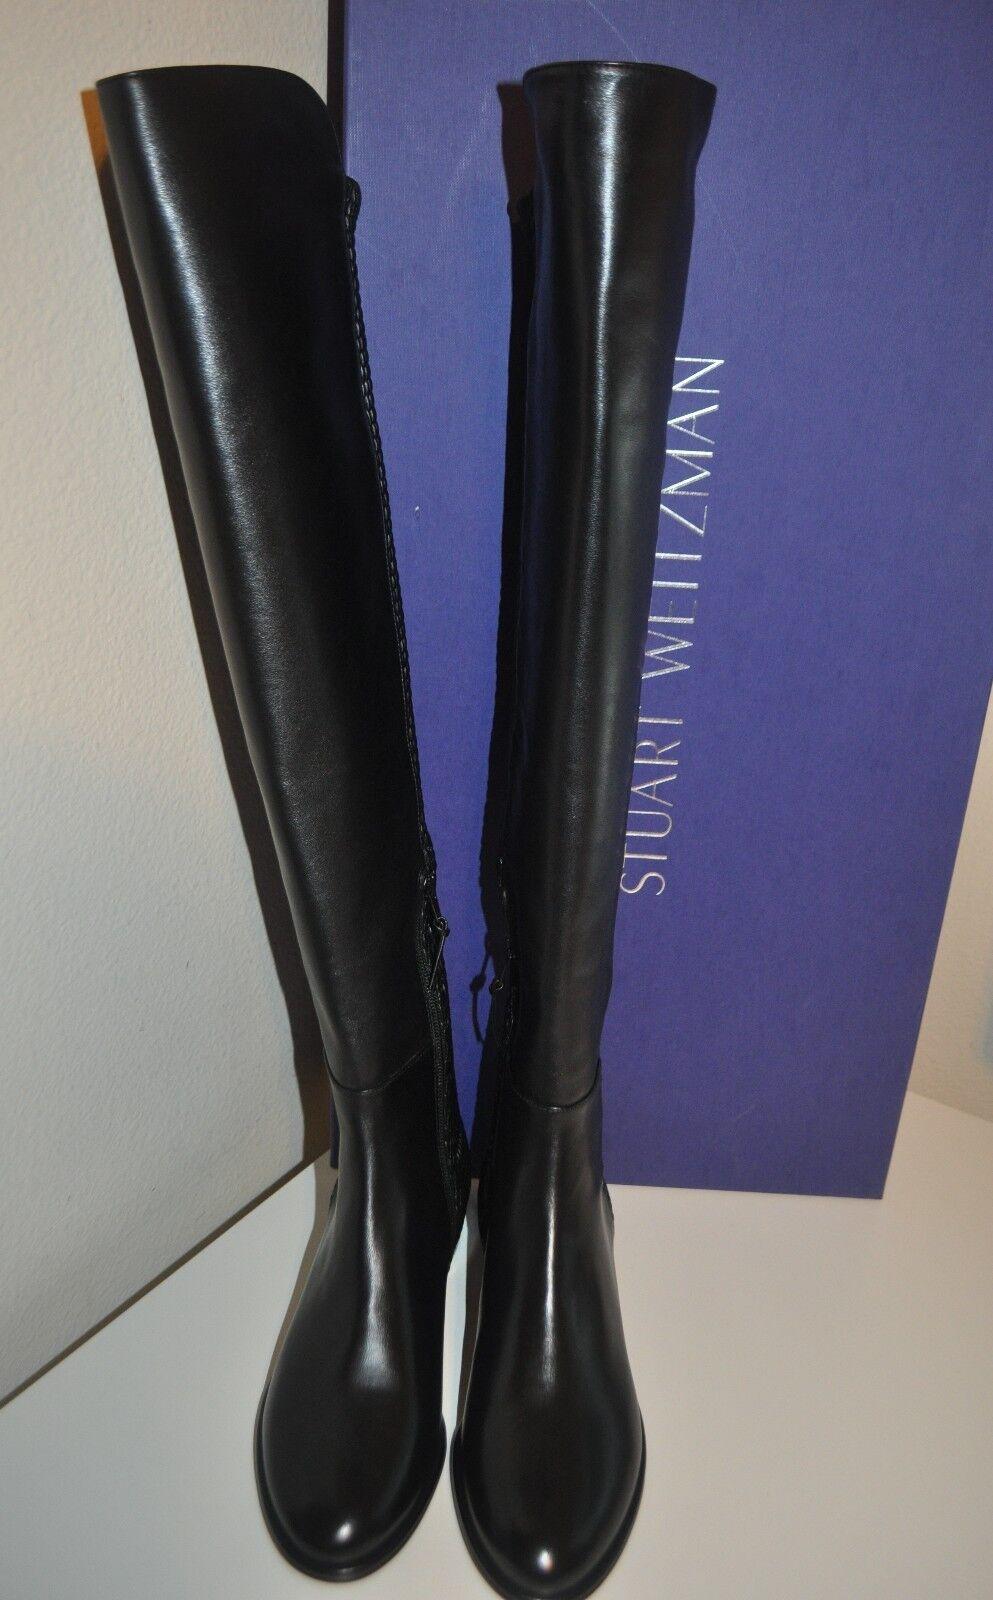 e5b38a8dcb7 NIB  785+ Stuart Weitzman Alljenn Over the Knee 5050 OTK Boot Black Leather  6.5